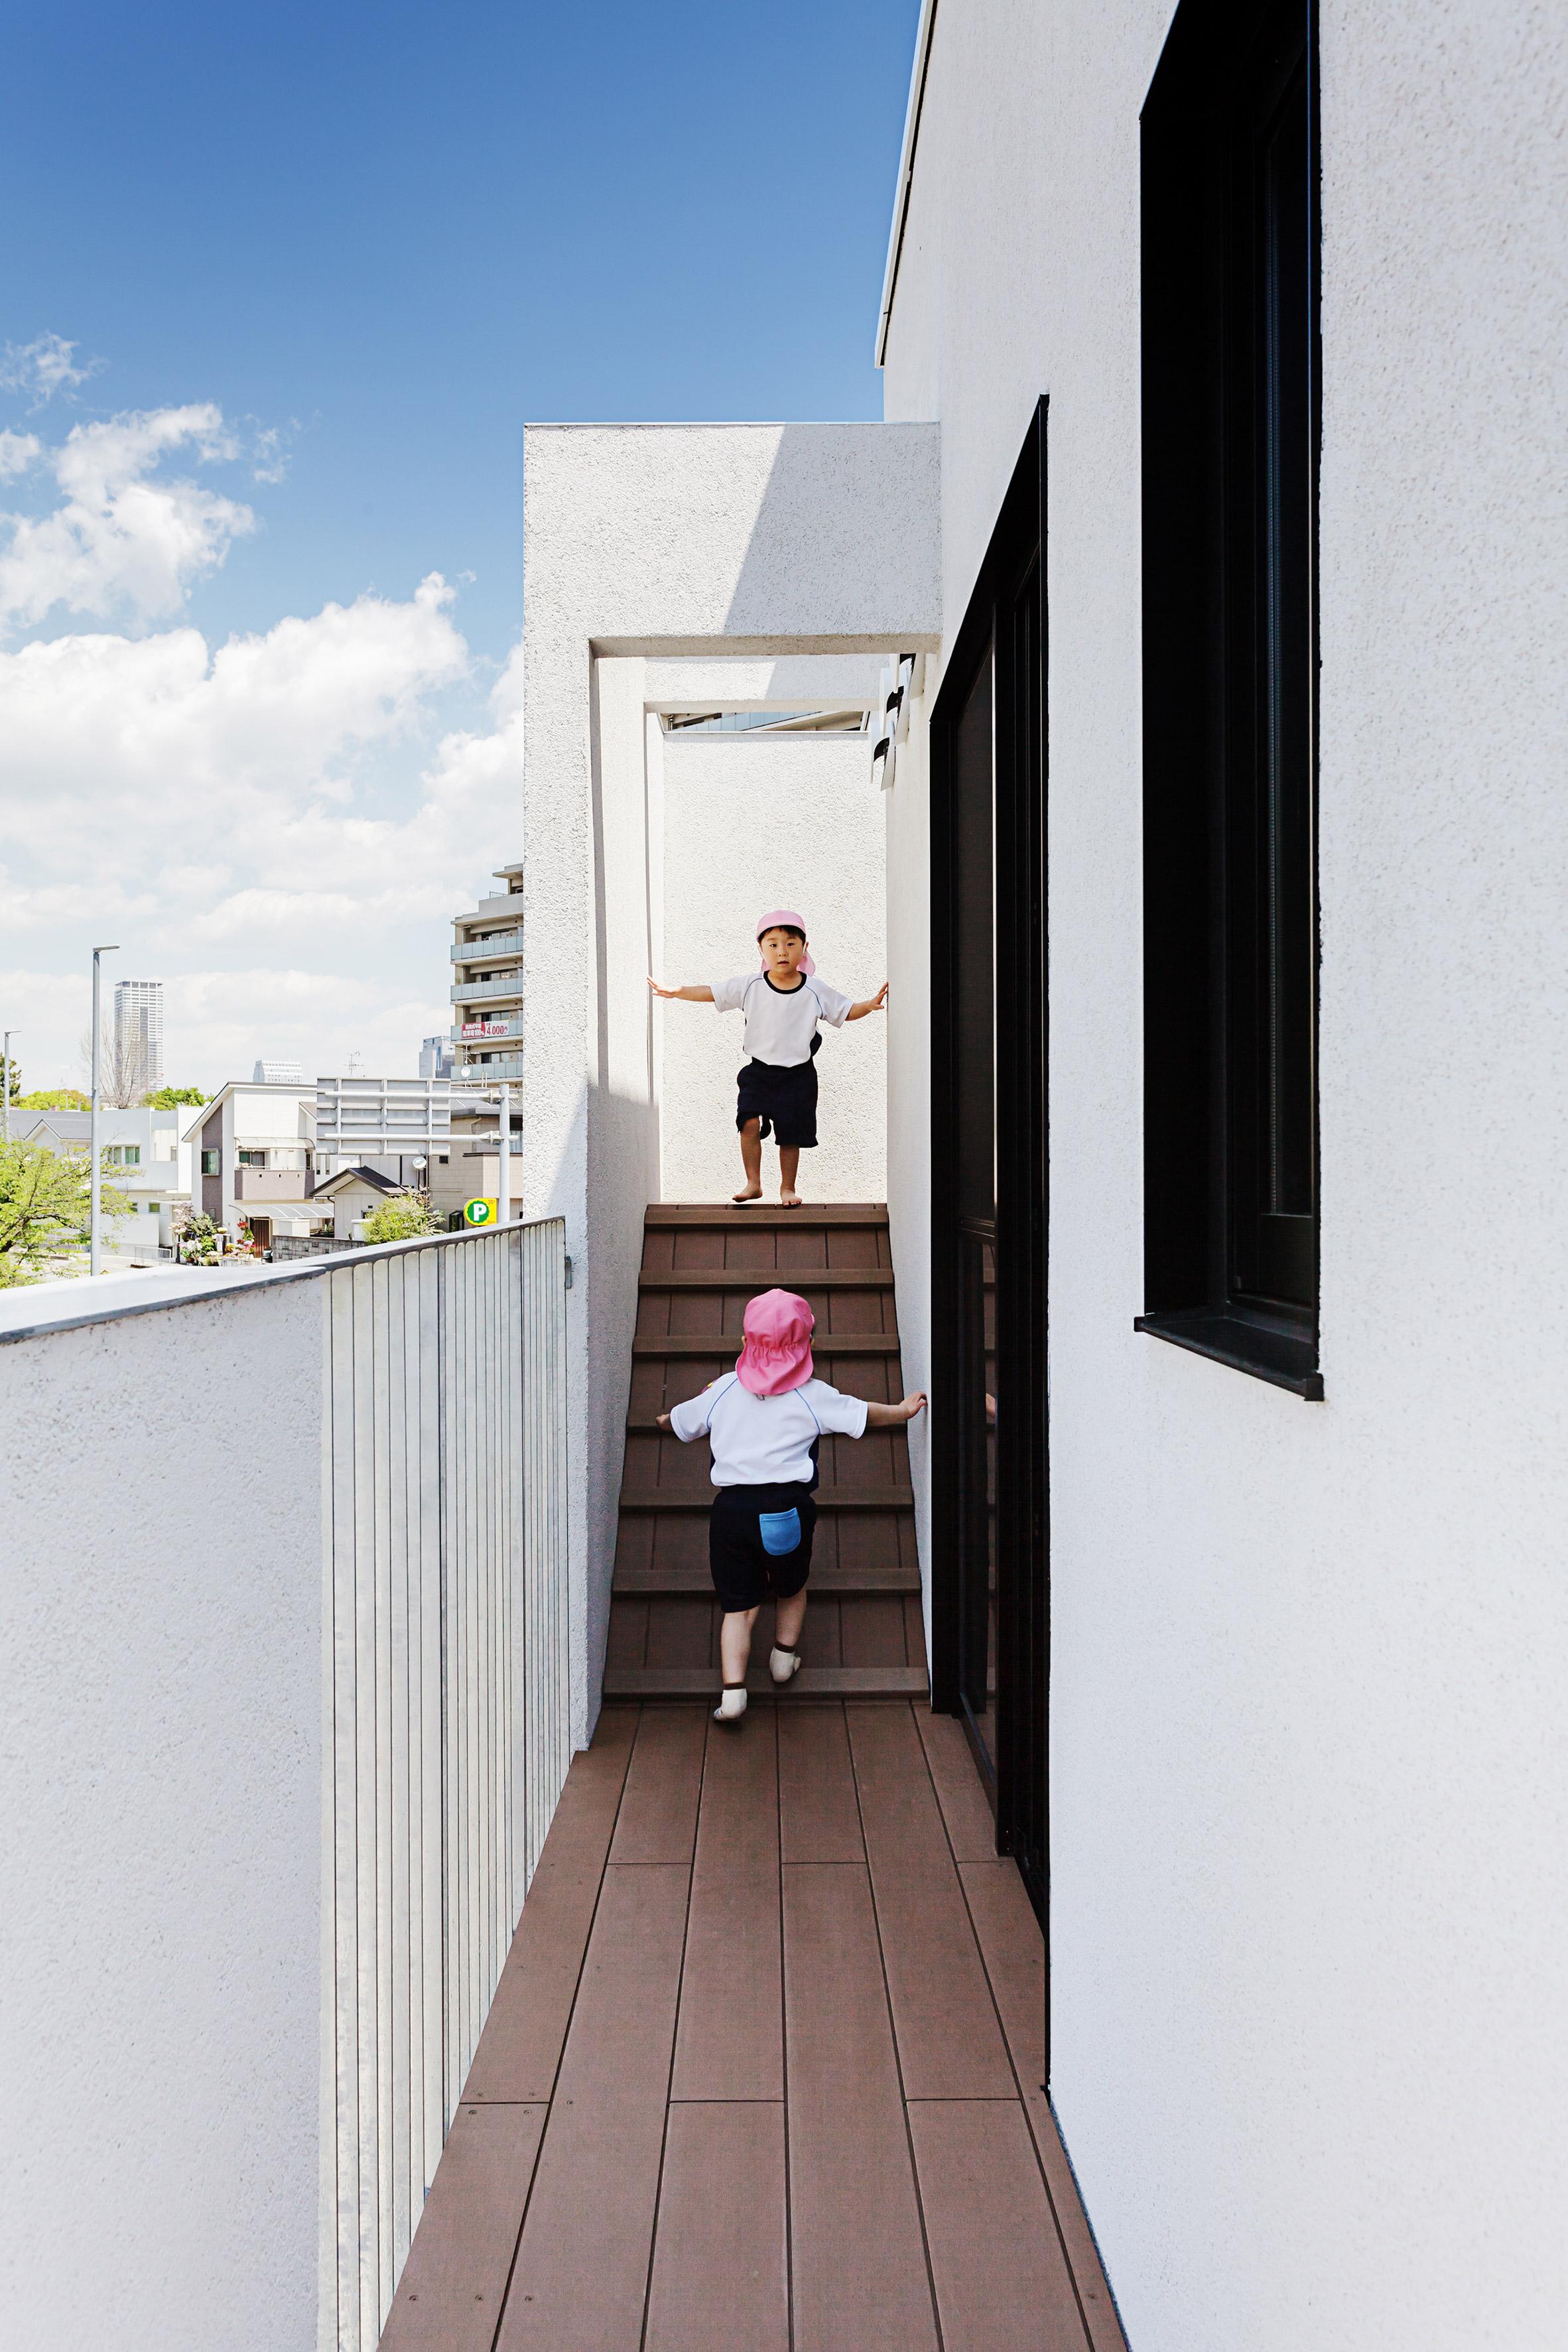 Hibinosekkei and Youji no Shiro Osaka Nursery